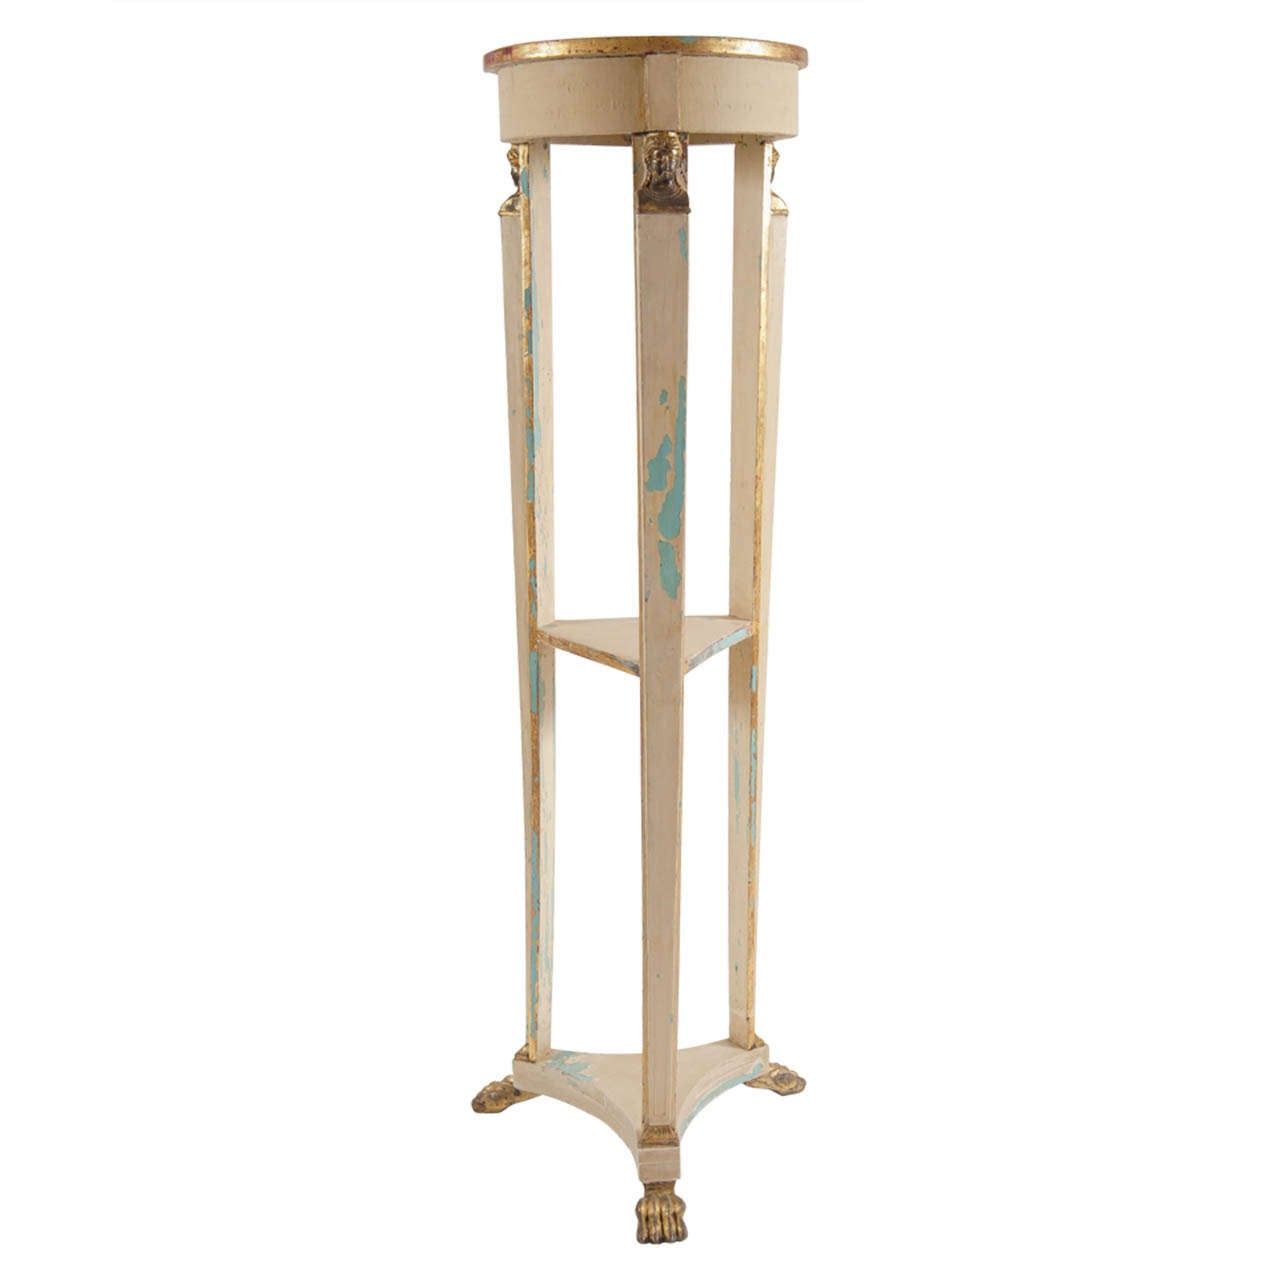 Fine Swedish Gustavian Tall Torchere/Pedestal/Stand circa 1805